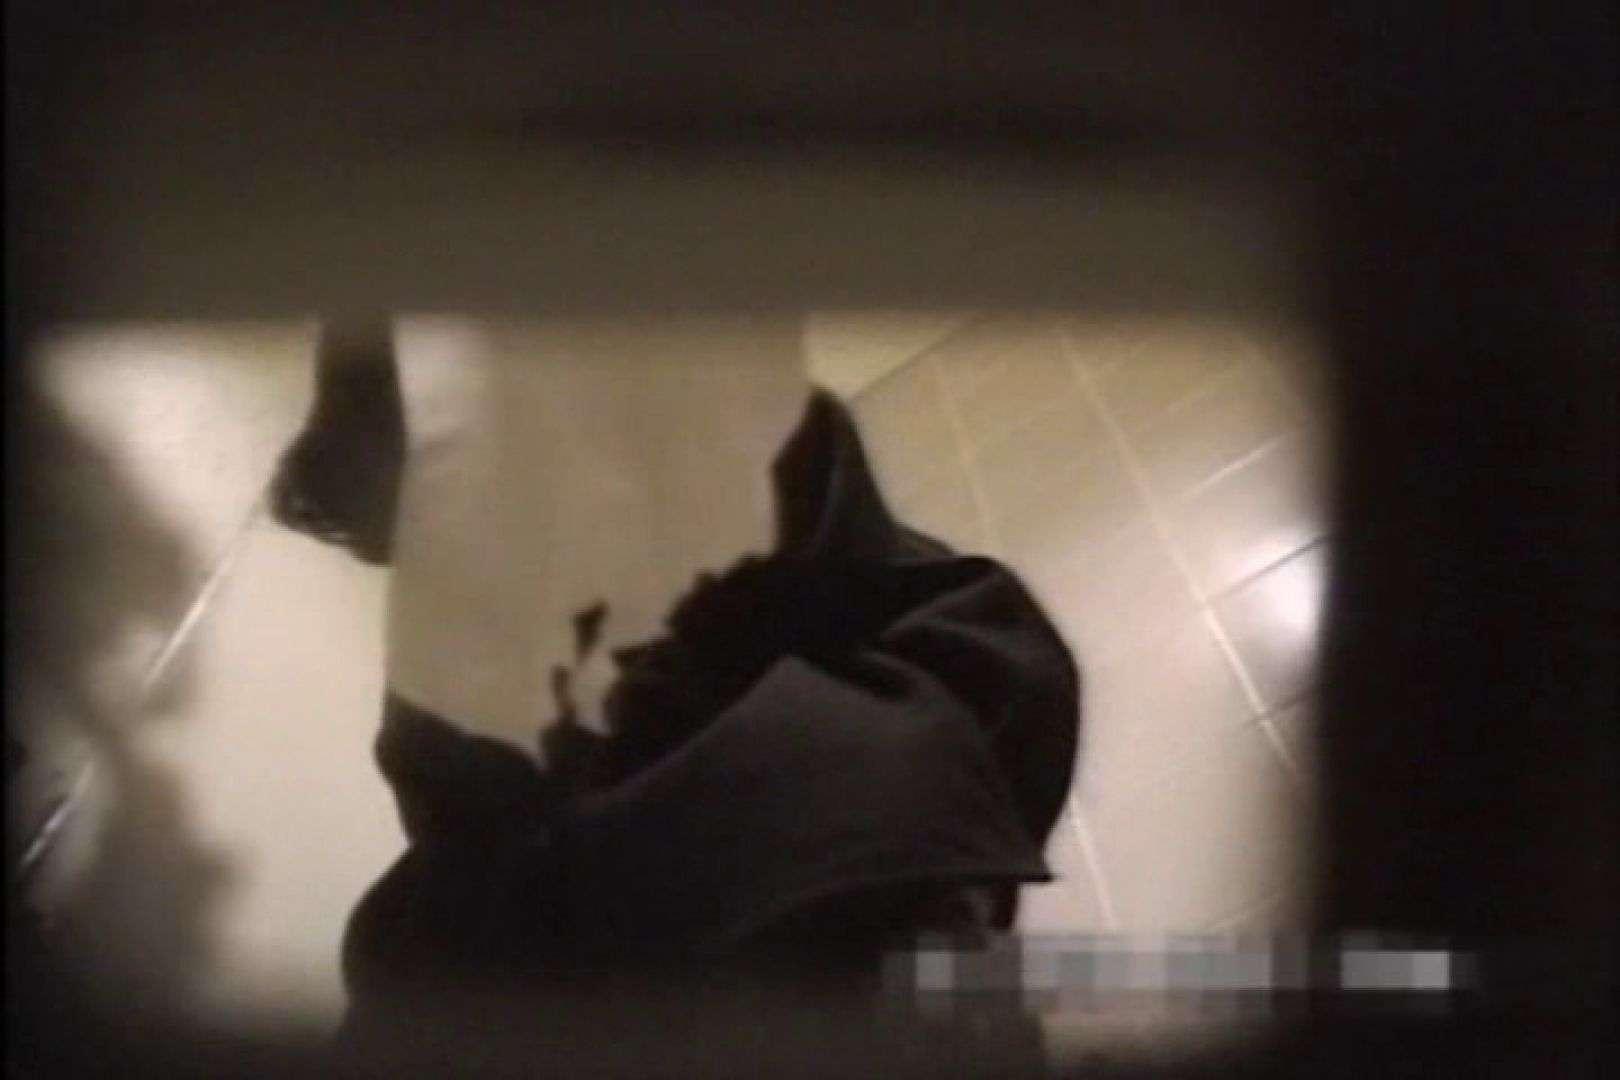 STY-013 実録!2カメde女子洗面所 洗面所 盗み撮り動画 113pic 37